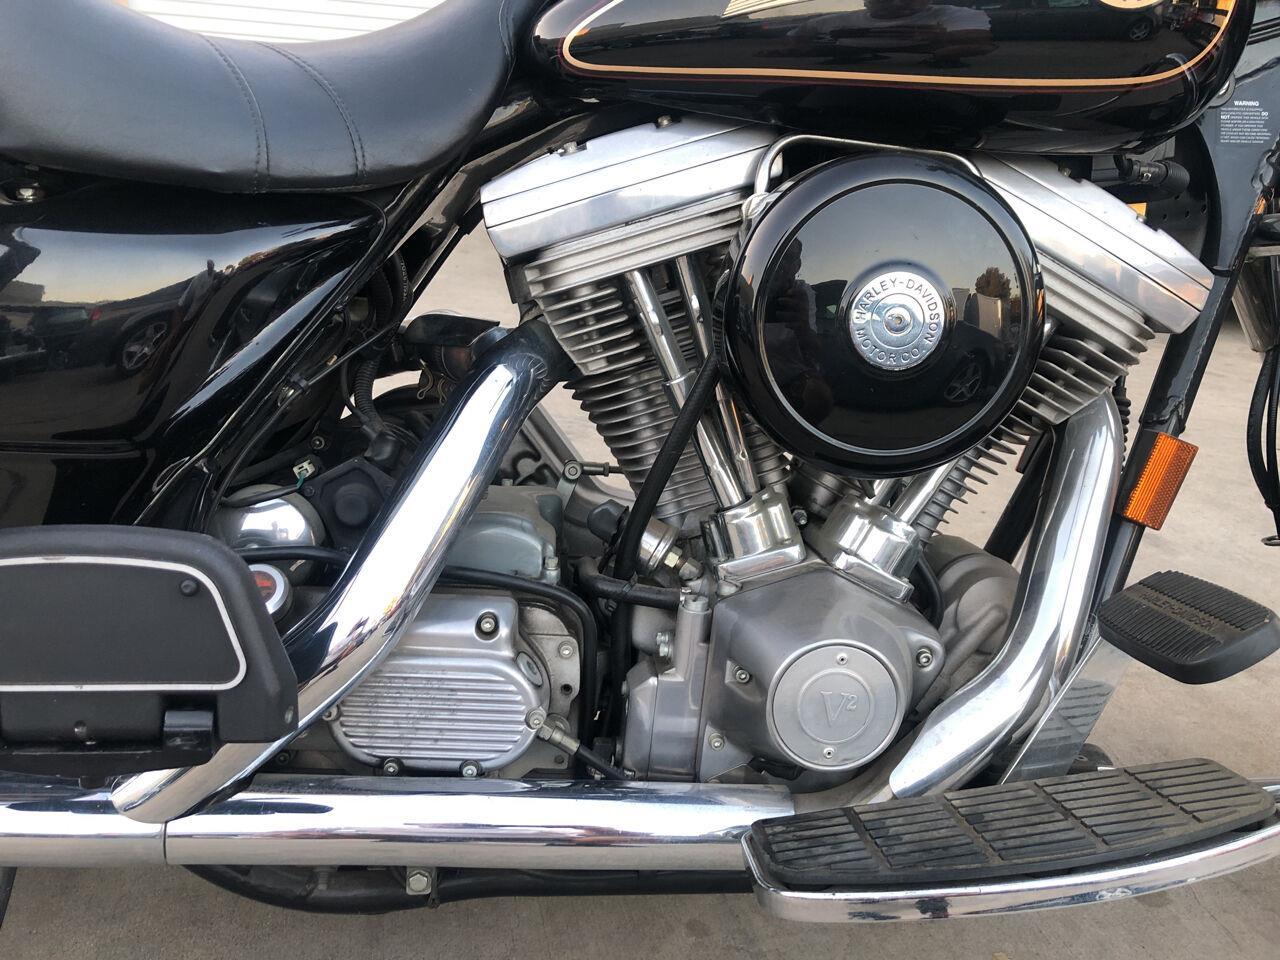 1996 Harley-Davidson Electra Glide (CC-1420013) for sale in Brea, California